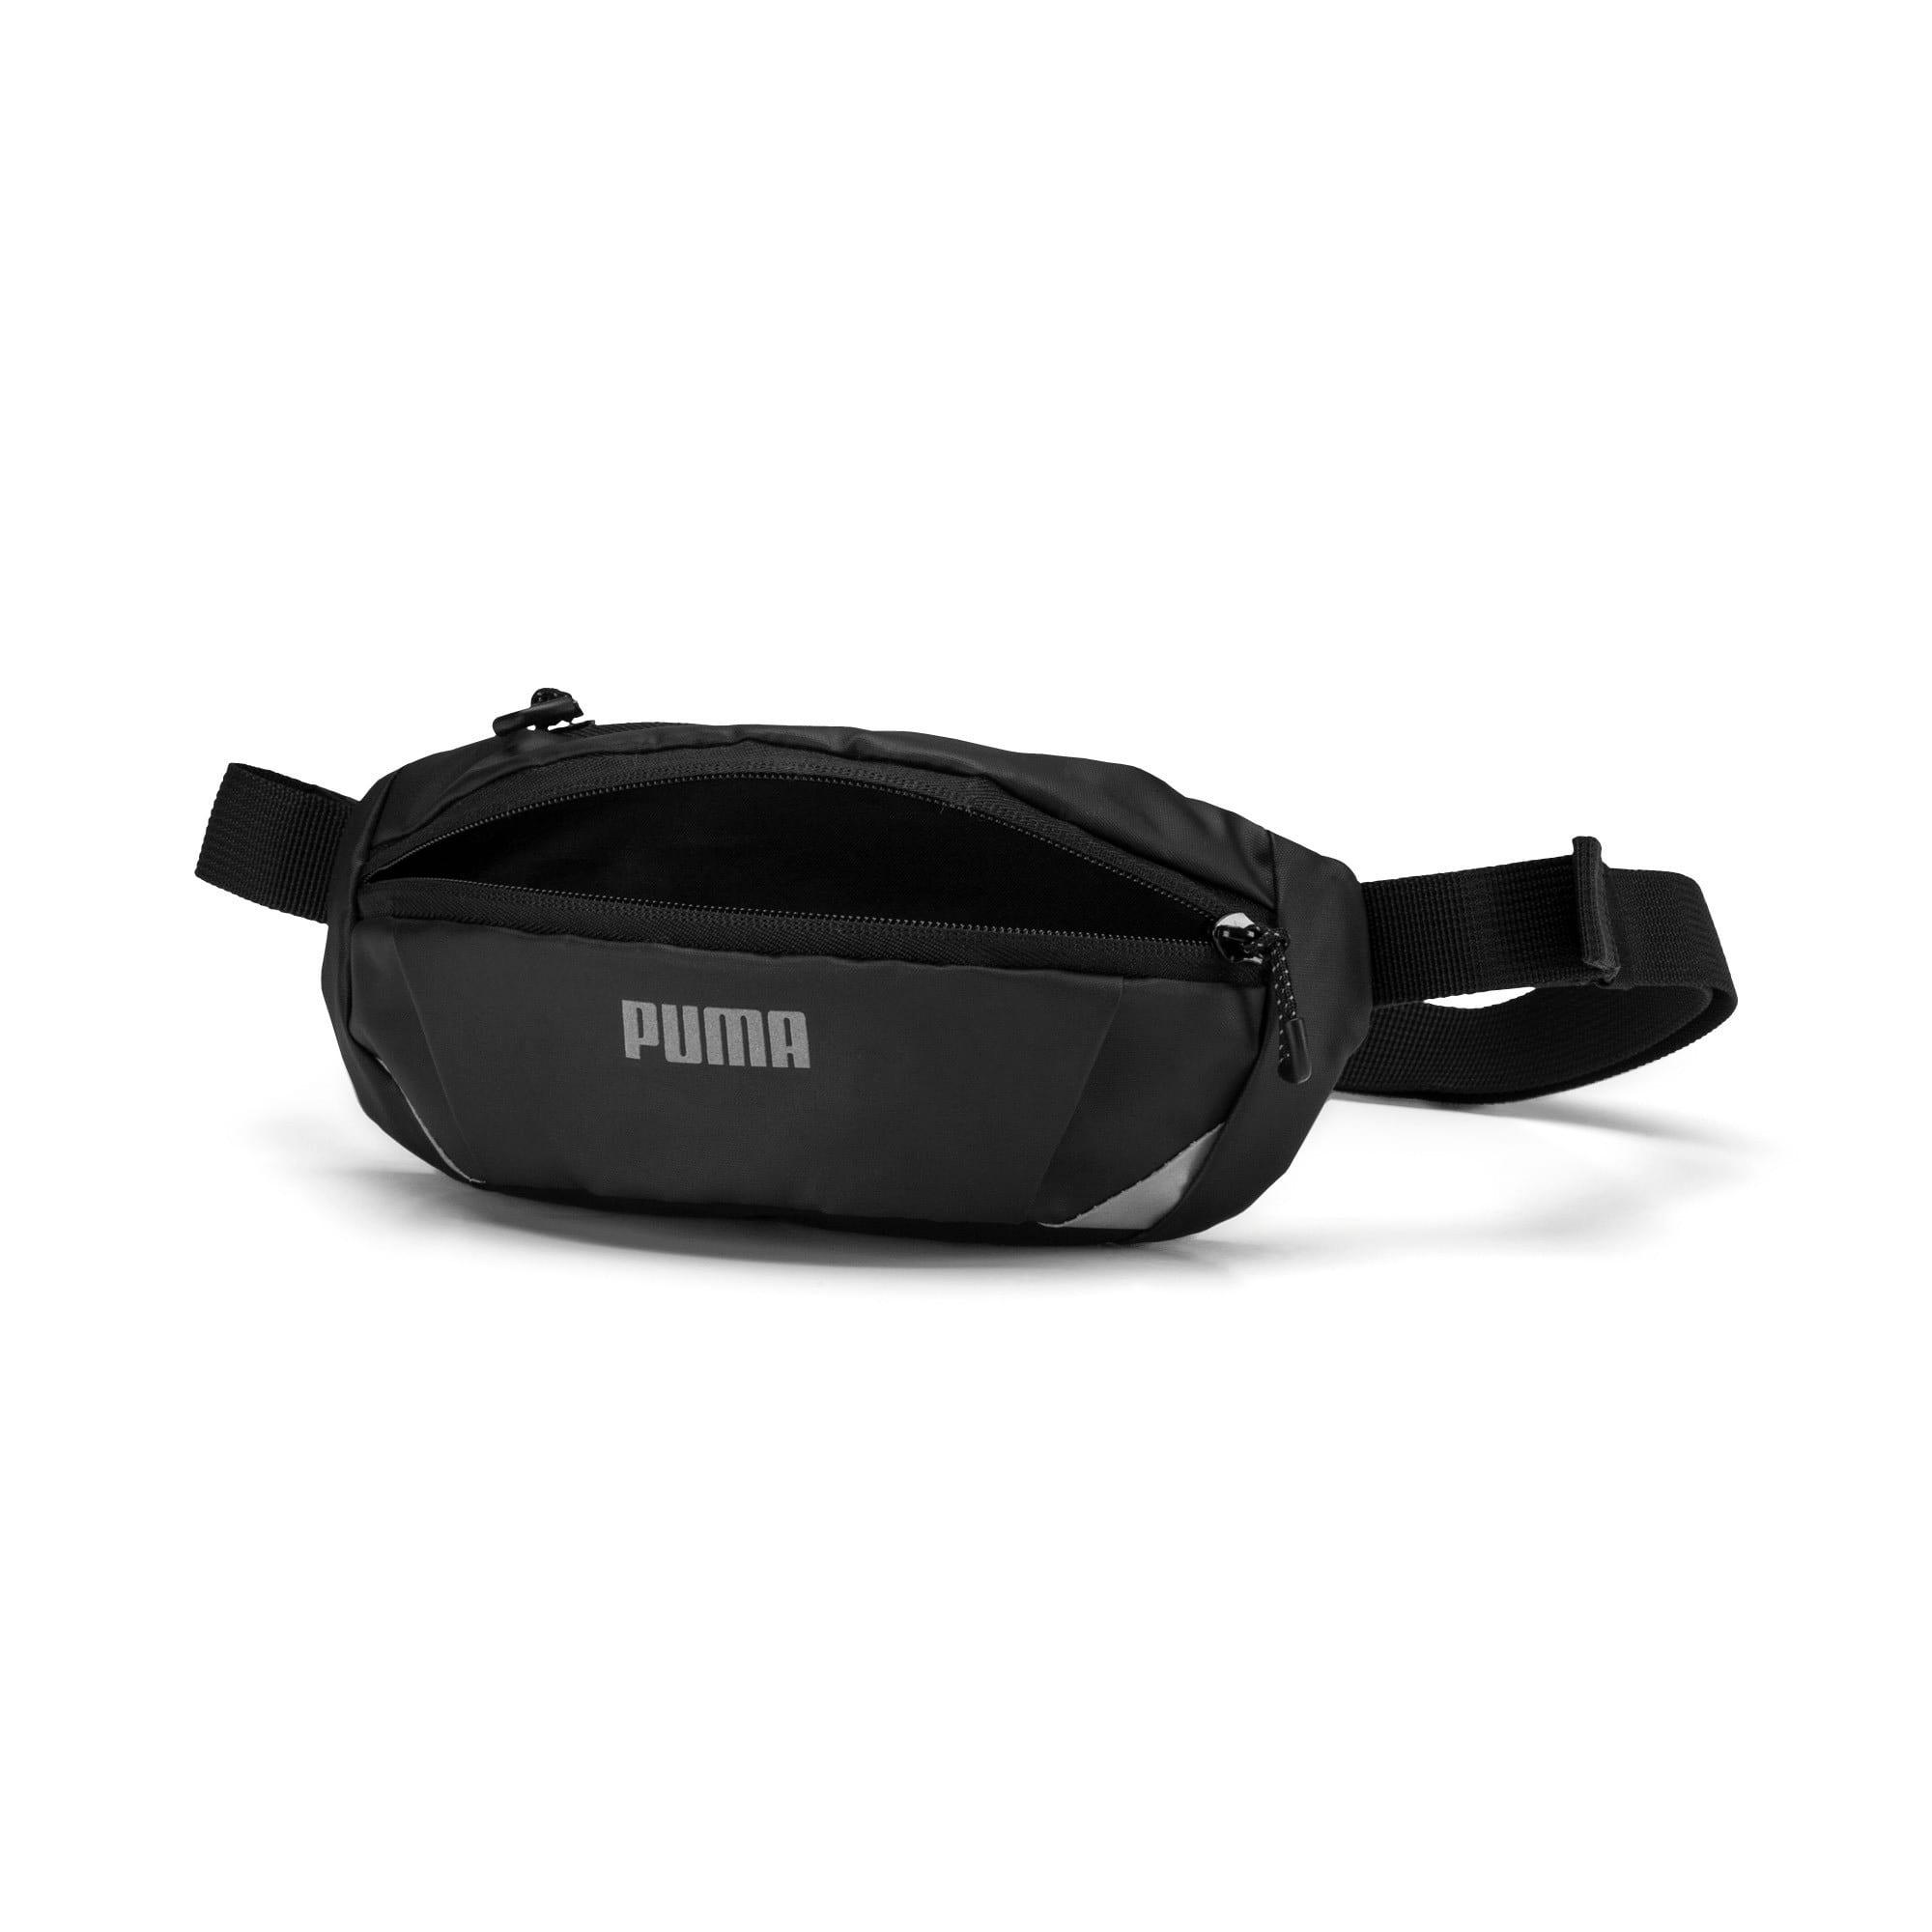 Thumbnail 5 of ランニング PR クラシック ウエストバッグ 0.8L, Puma Black, medium-JPN